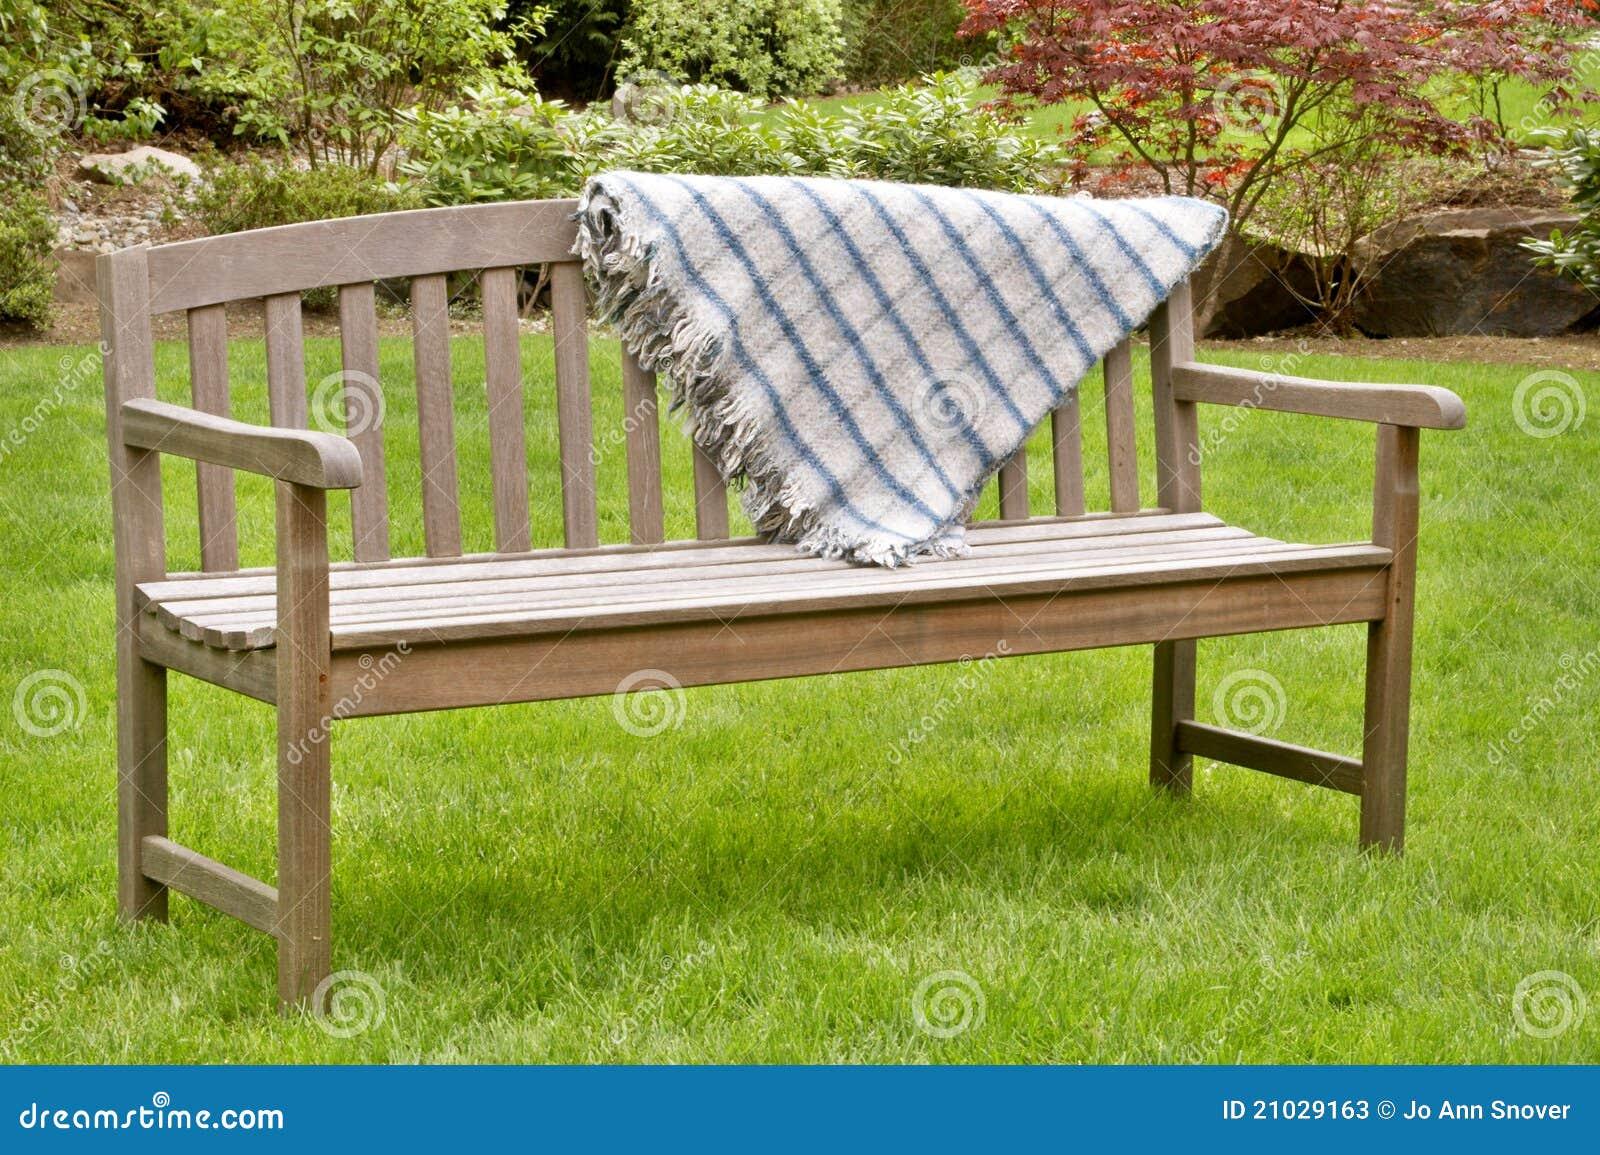 banco de jardim vetor:Wooden Garden Bench